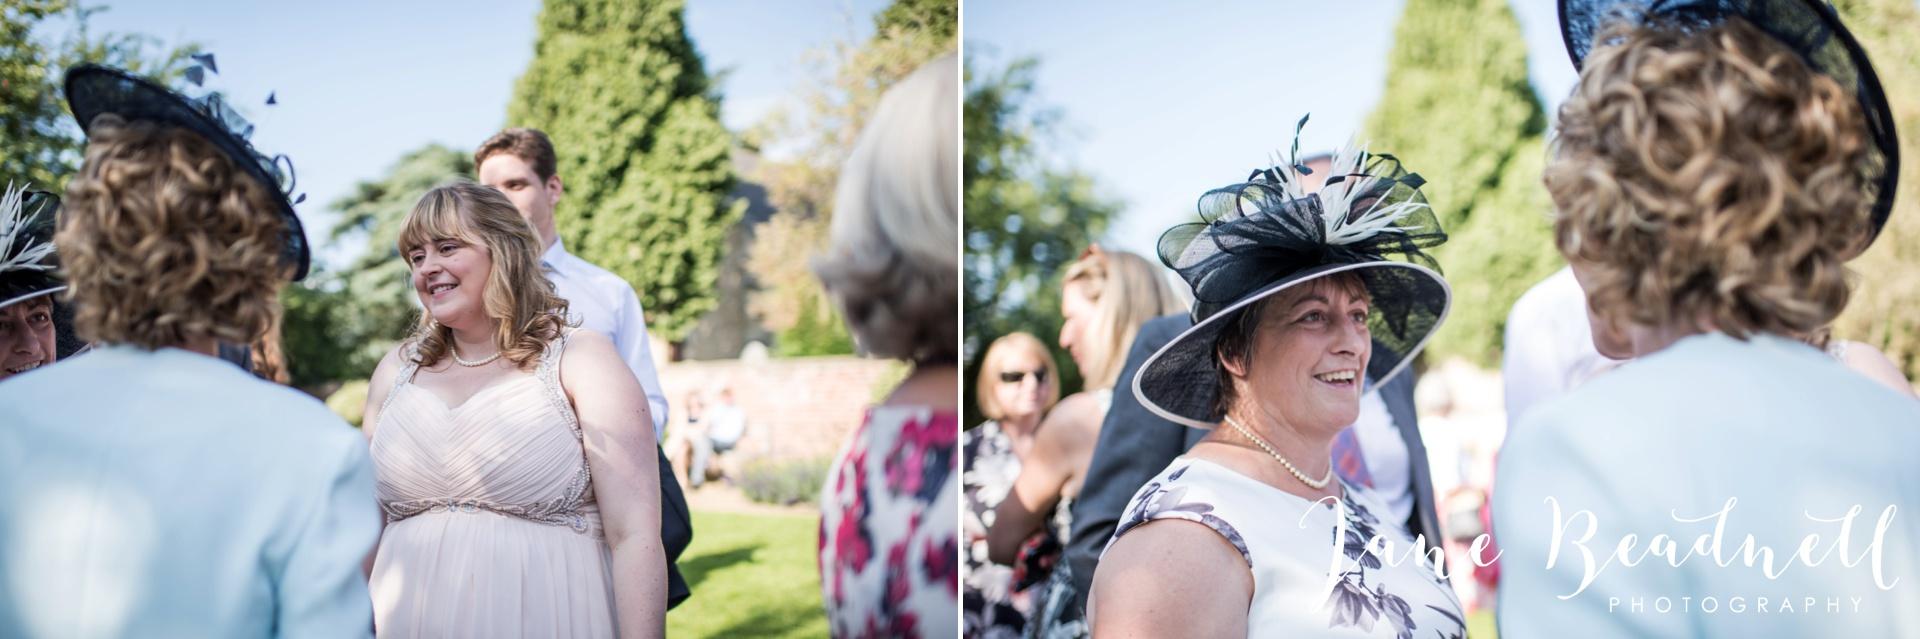 yorkshire-fine-art-wedding-photographer-jane-beadnell-photography-poppleton-york_0084